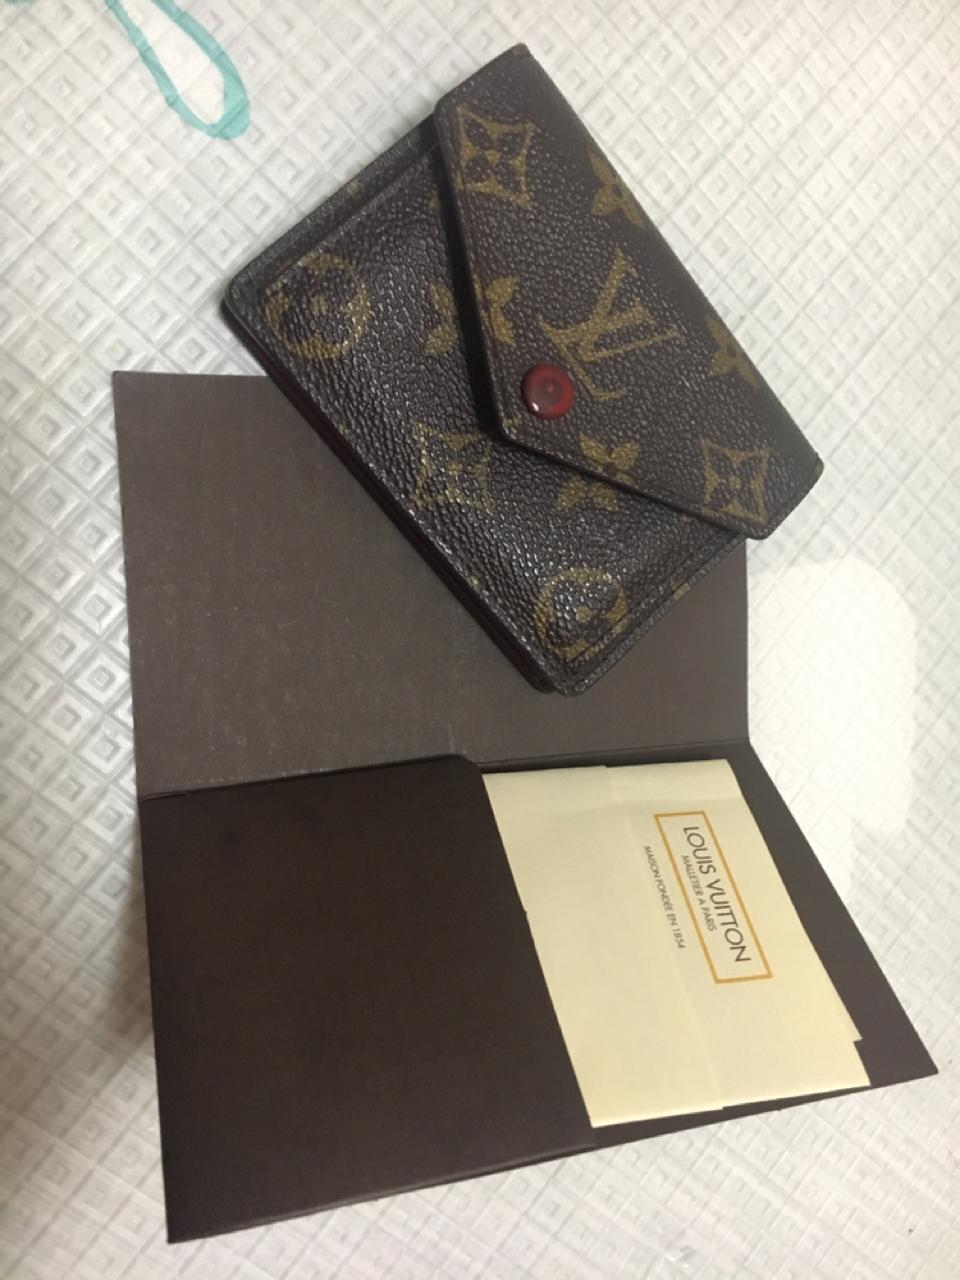 marie mono 마이월릿 루이비통 반지갑 이니셜 마킹됨